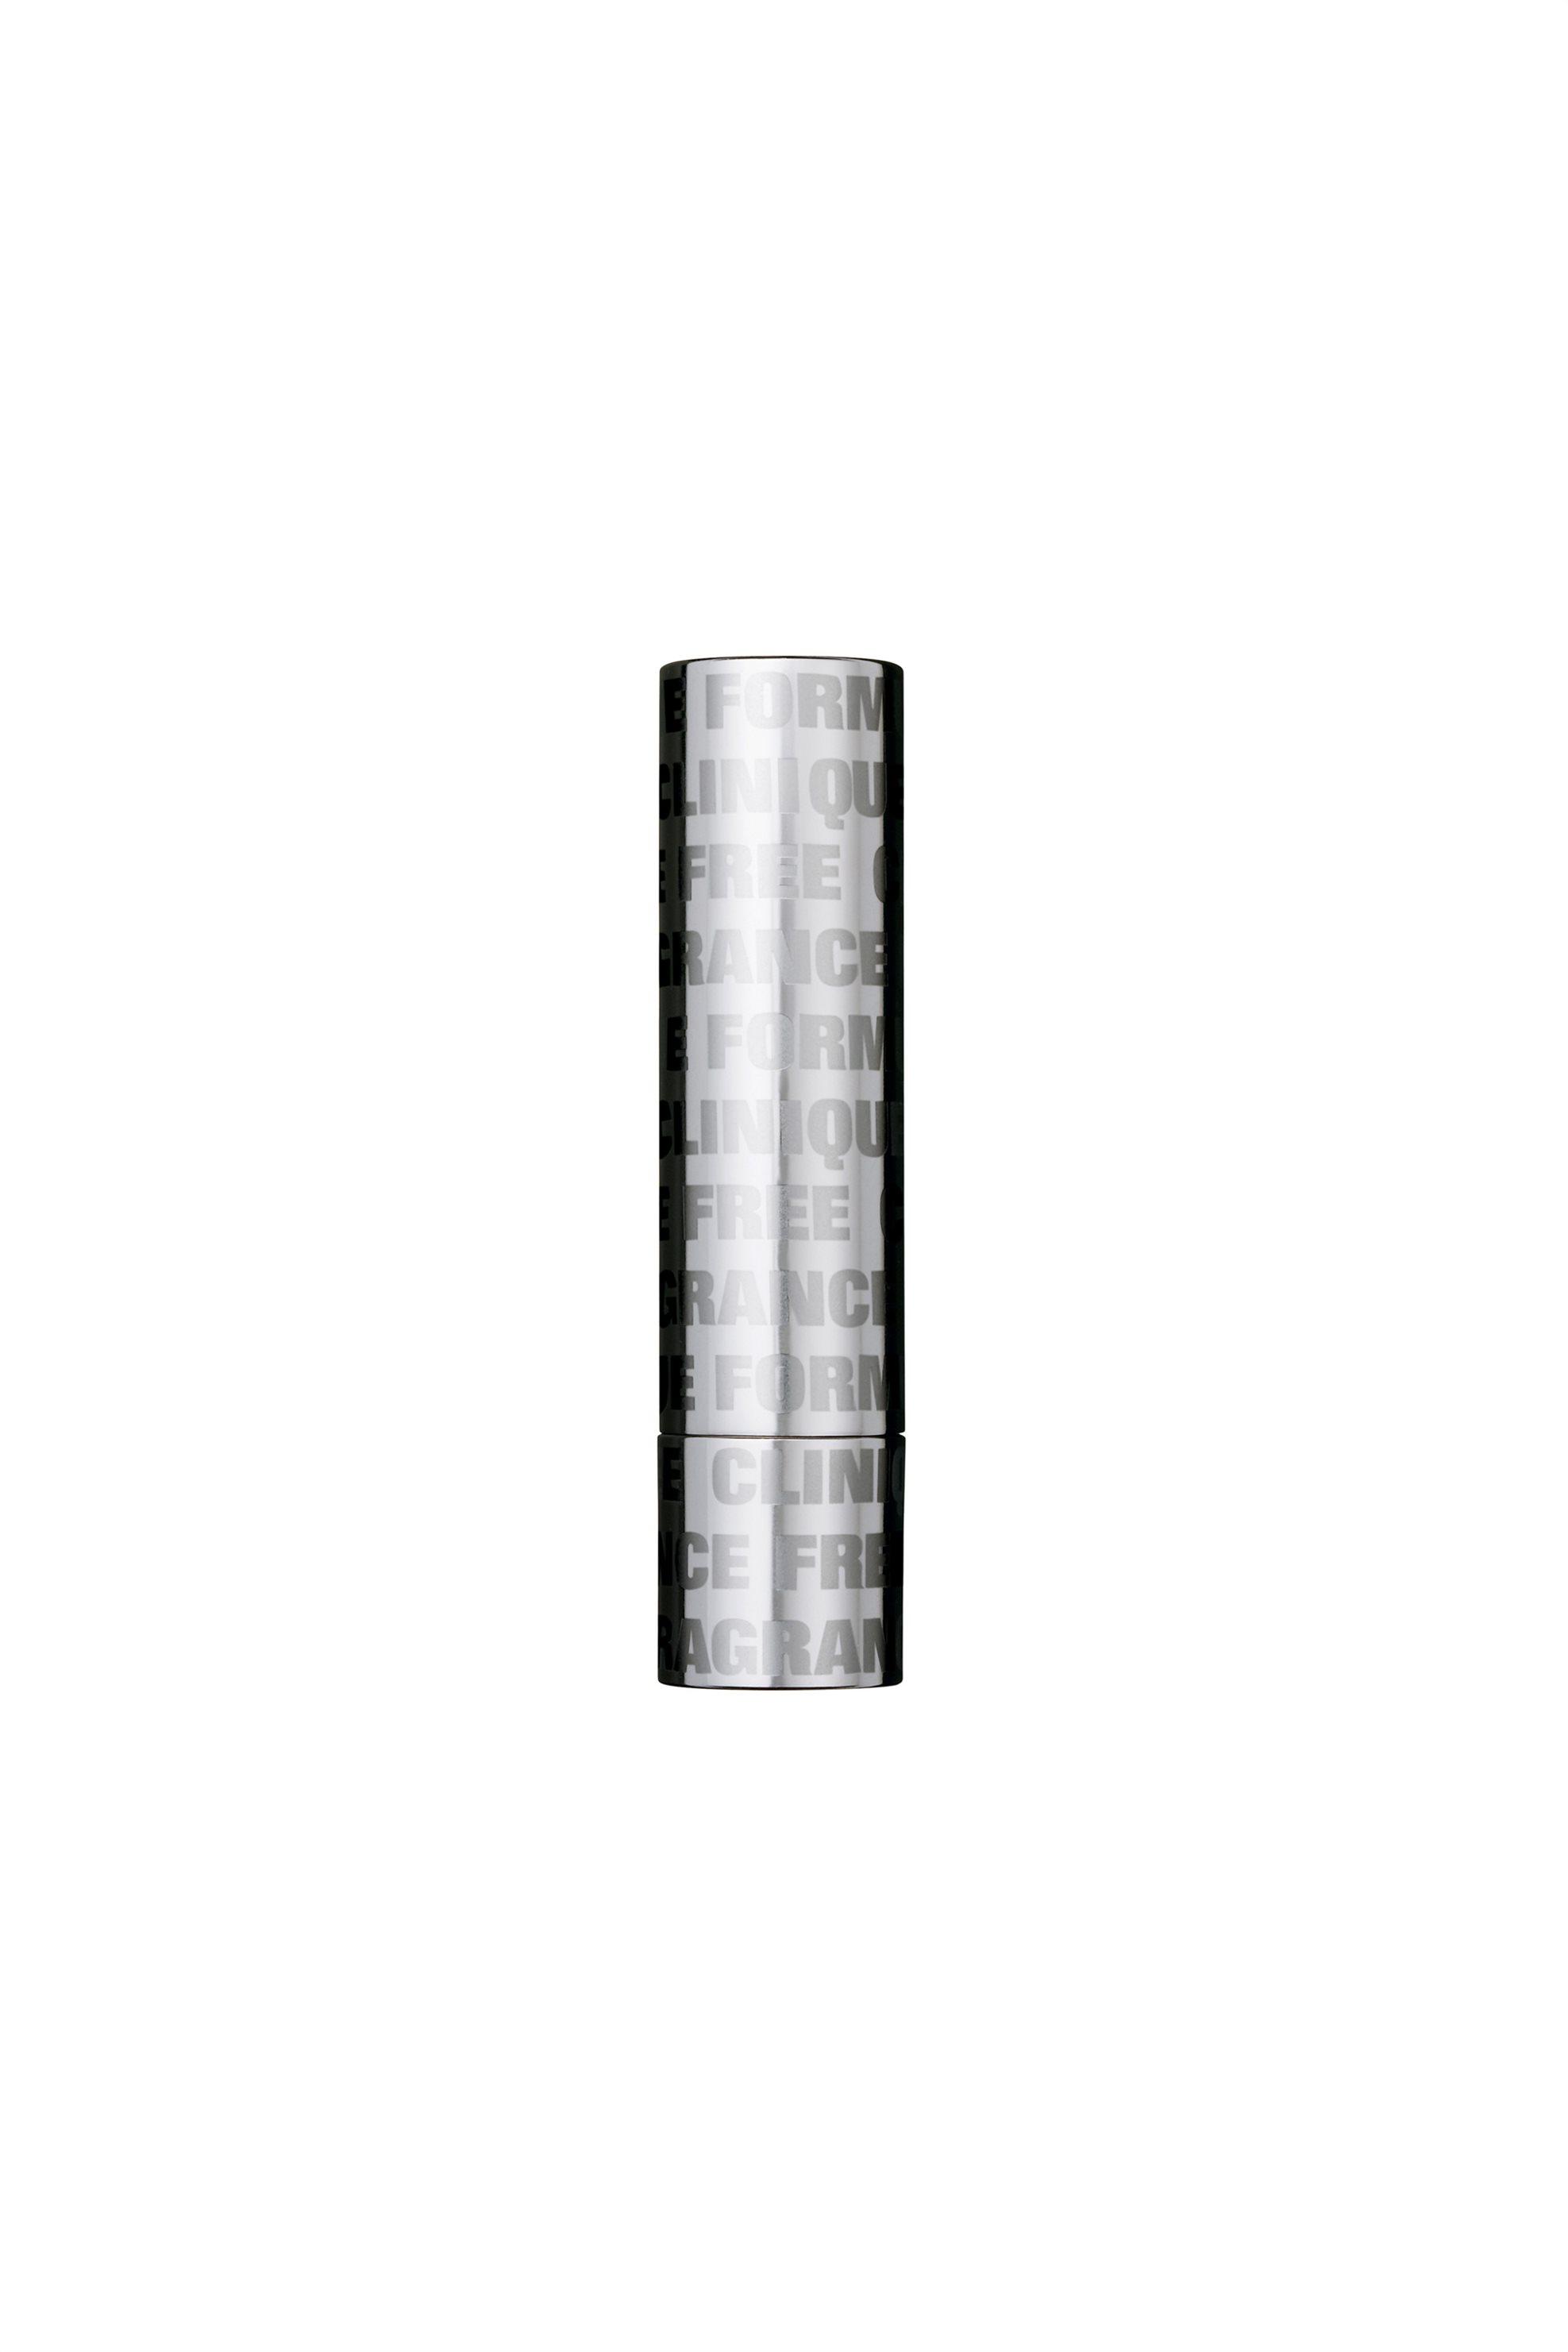 Clinique Repairwear™ Intensive Lip Treatment 3.6 gr. - 6FGH010000 ομορφια   καλλυντικα επιλεκτικησ   περιποίηση προσώπου   εξειδικευμένη φροντίδα